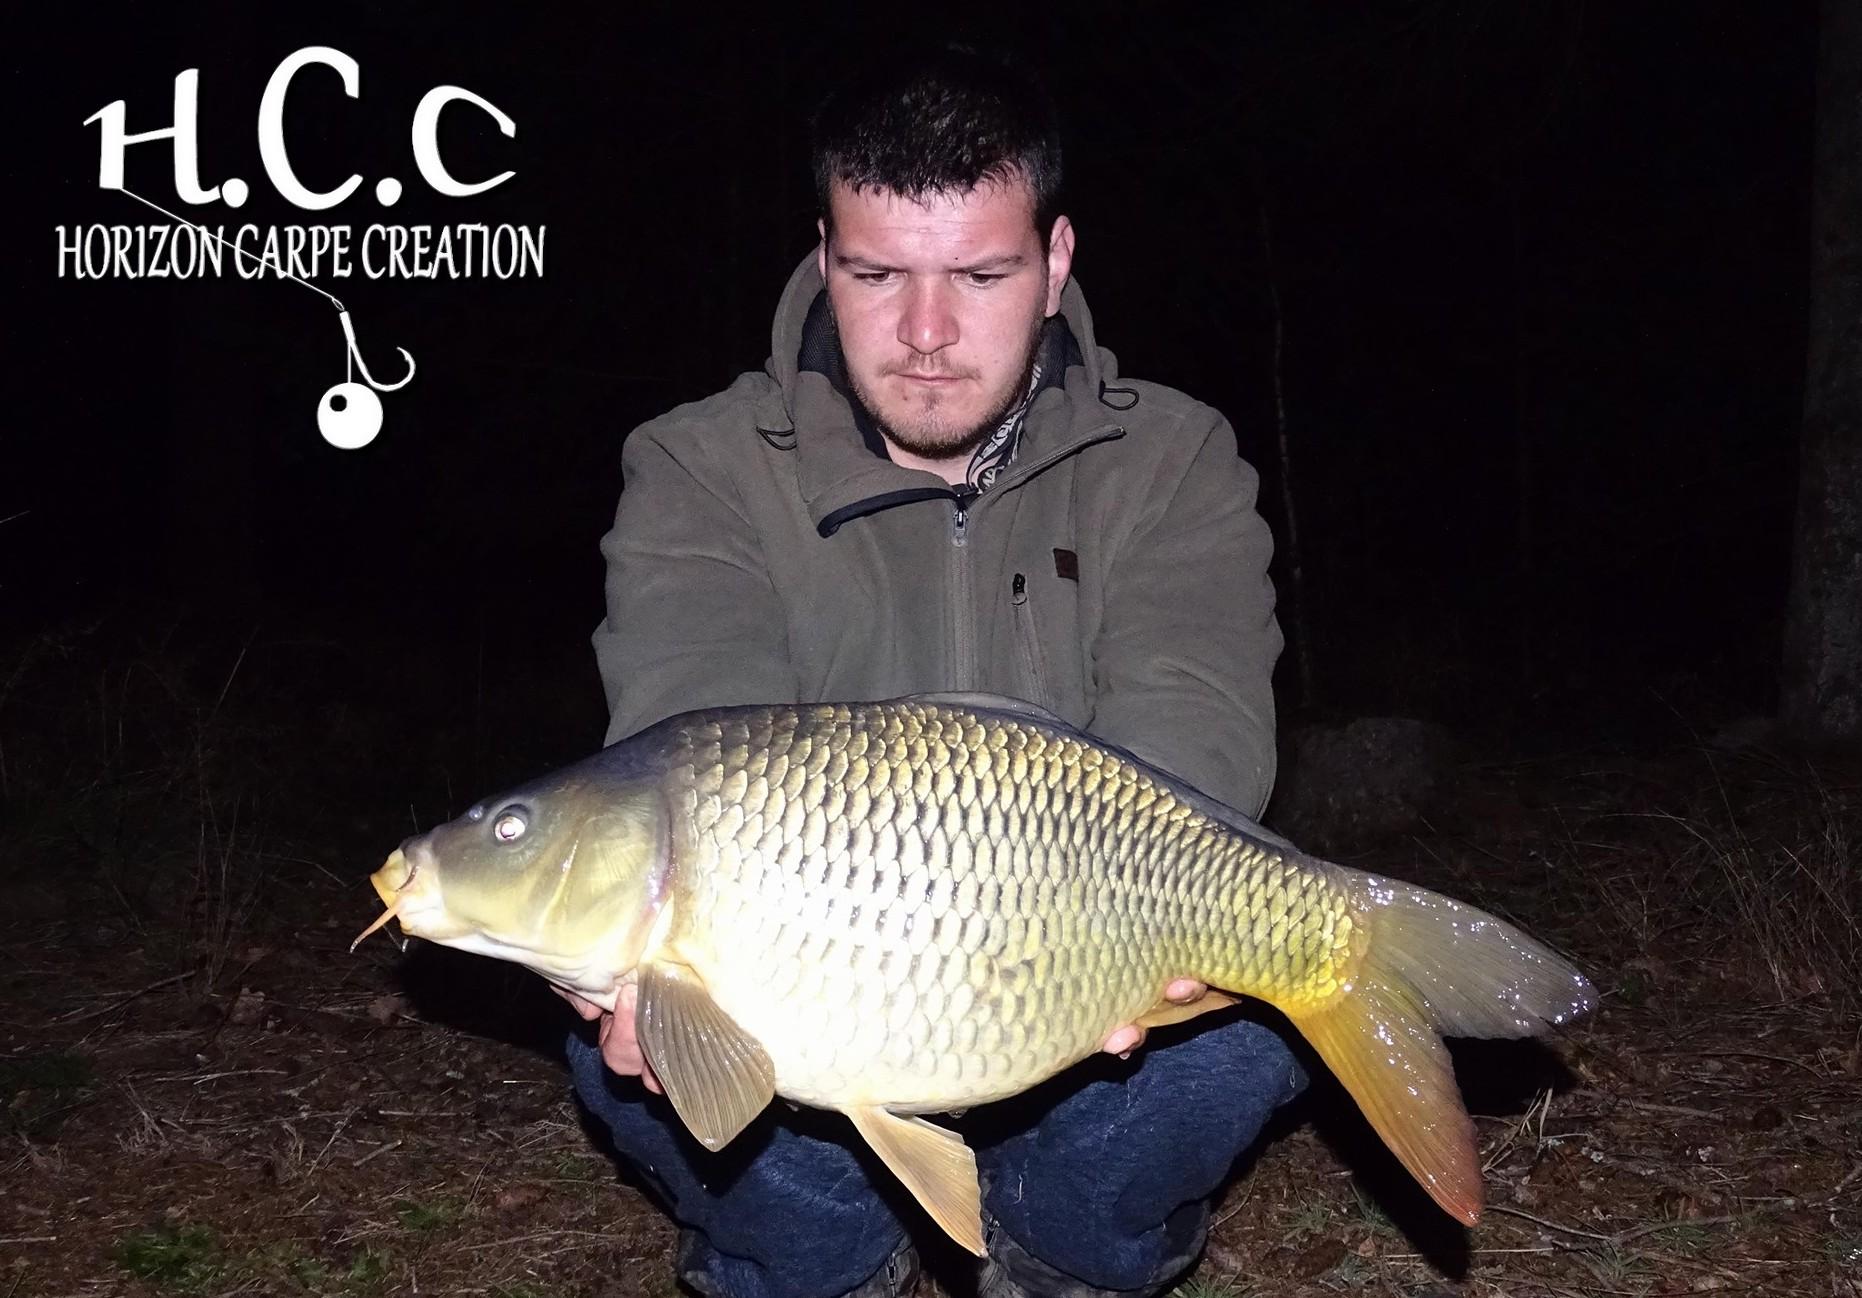 Mickahcc01 3